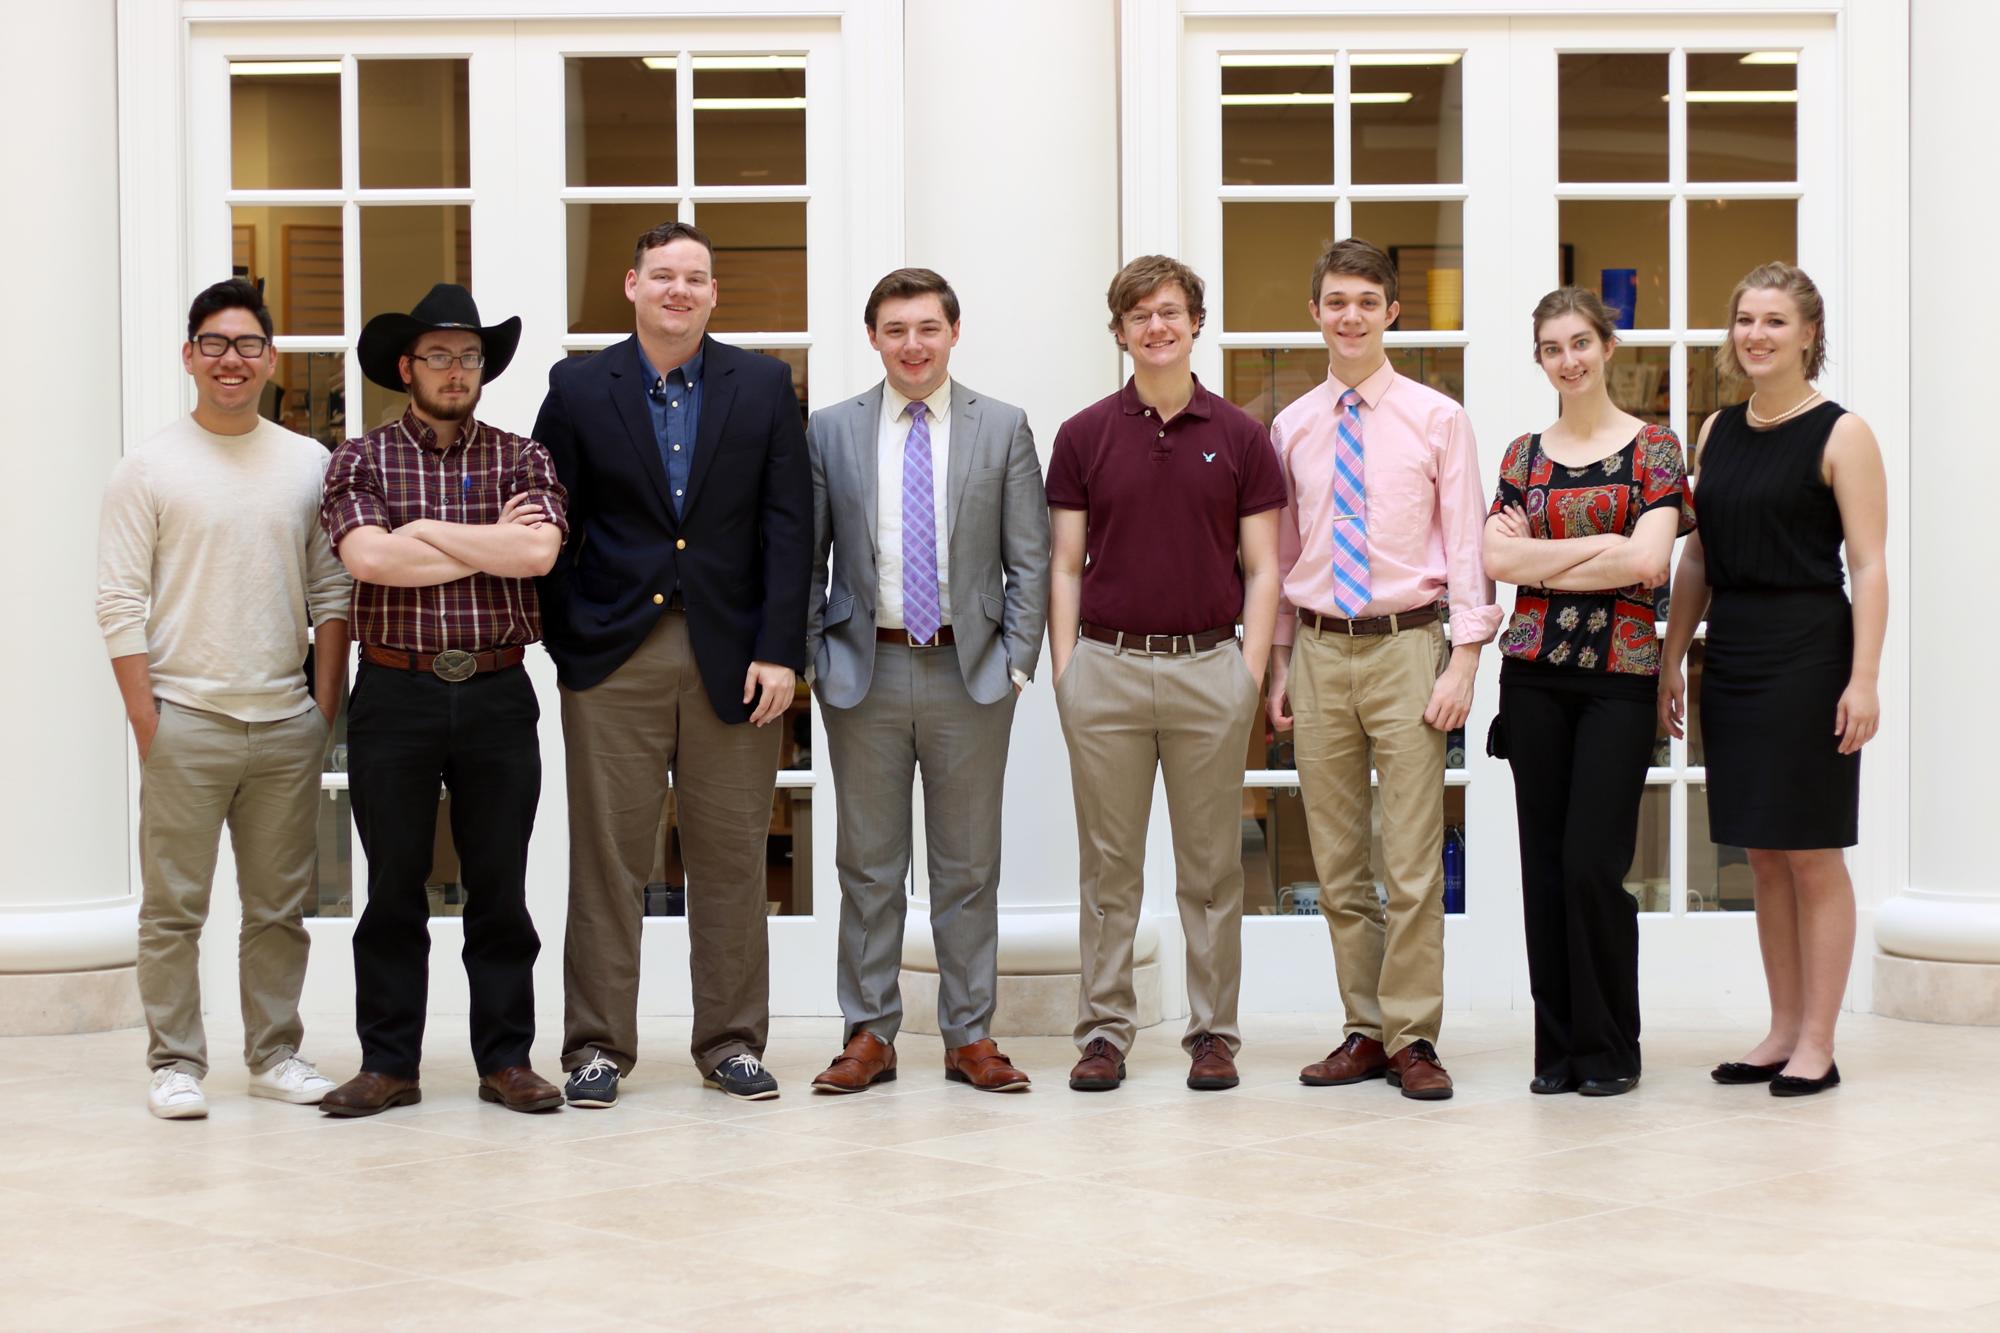 Daniel Thetford, Matt Hoke, and the members of their campaign team